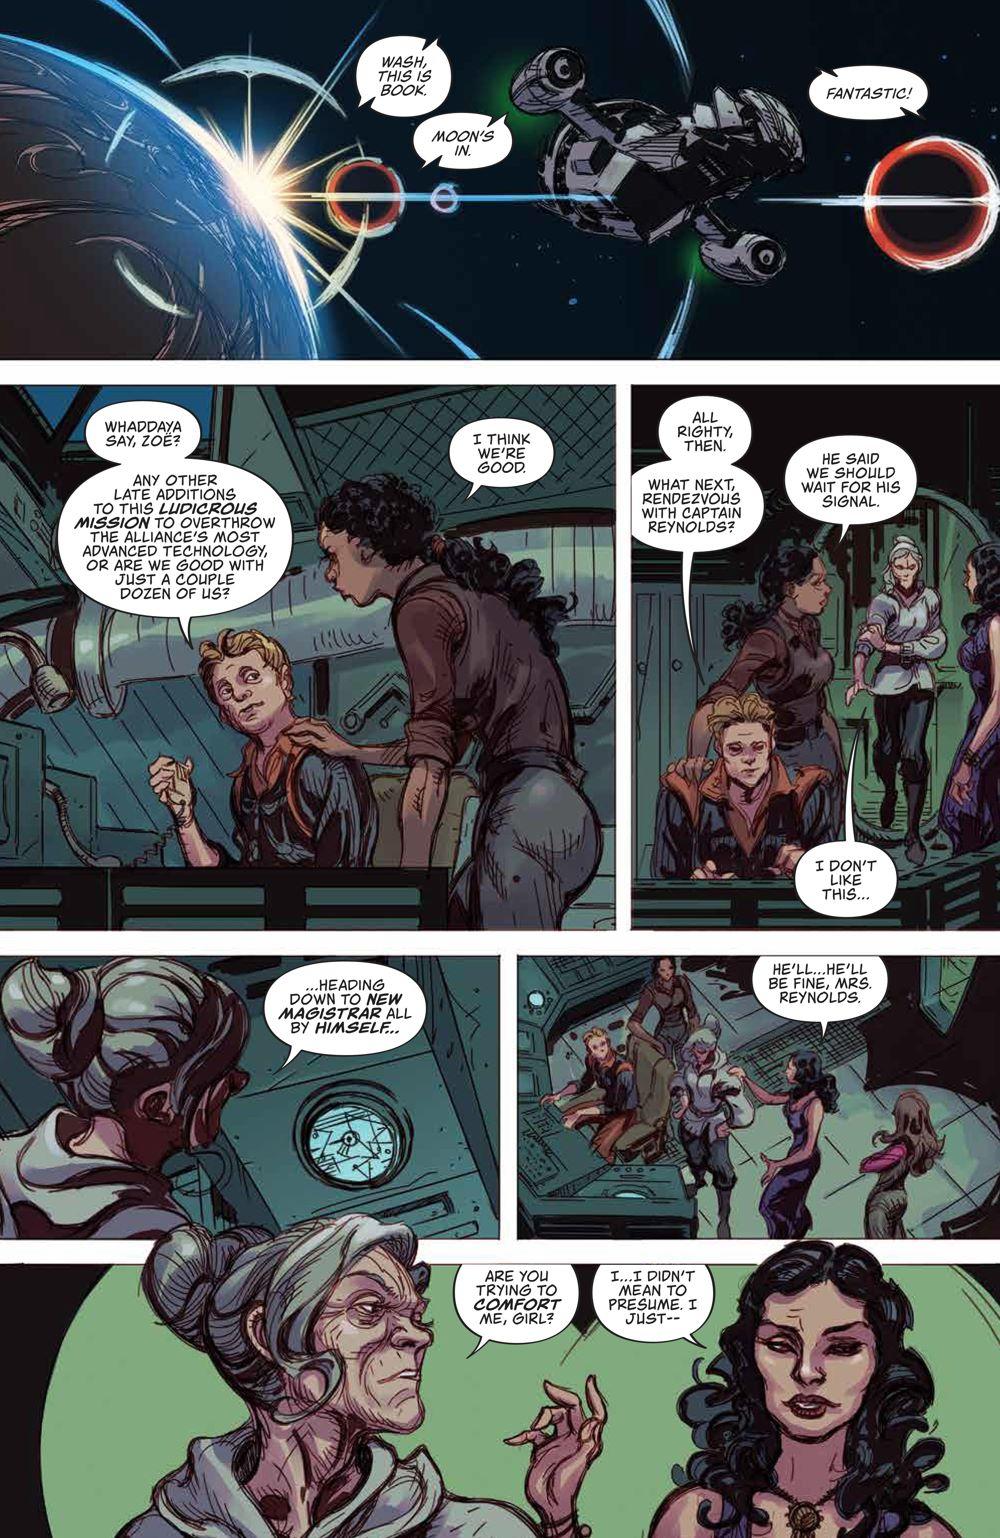 Firefly_BlueSunRising_v2_HC_18 ComicList Previews: FIREFLY BLUE SUN RISING VOLUME 2 HC